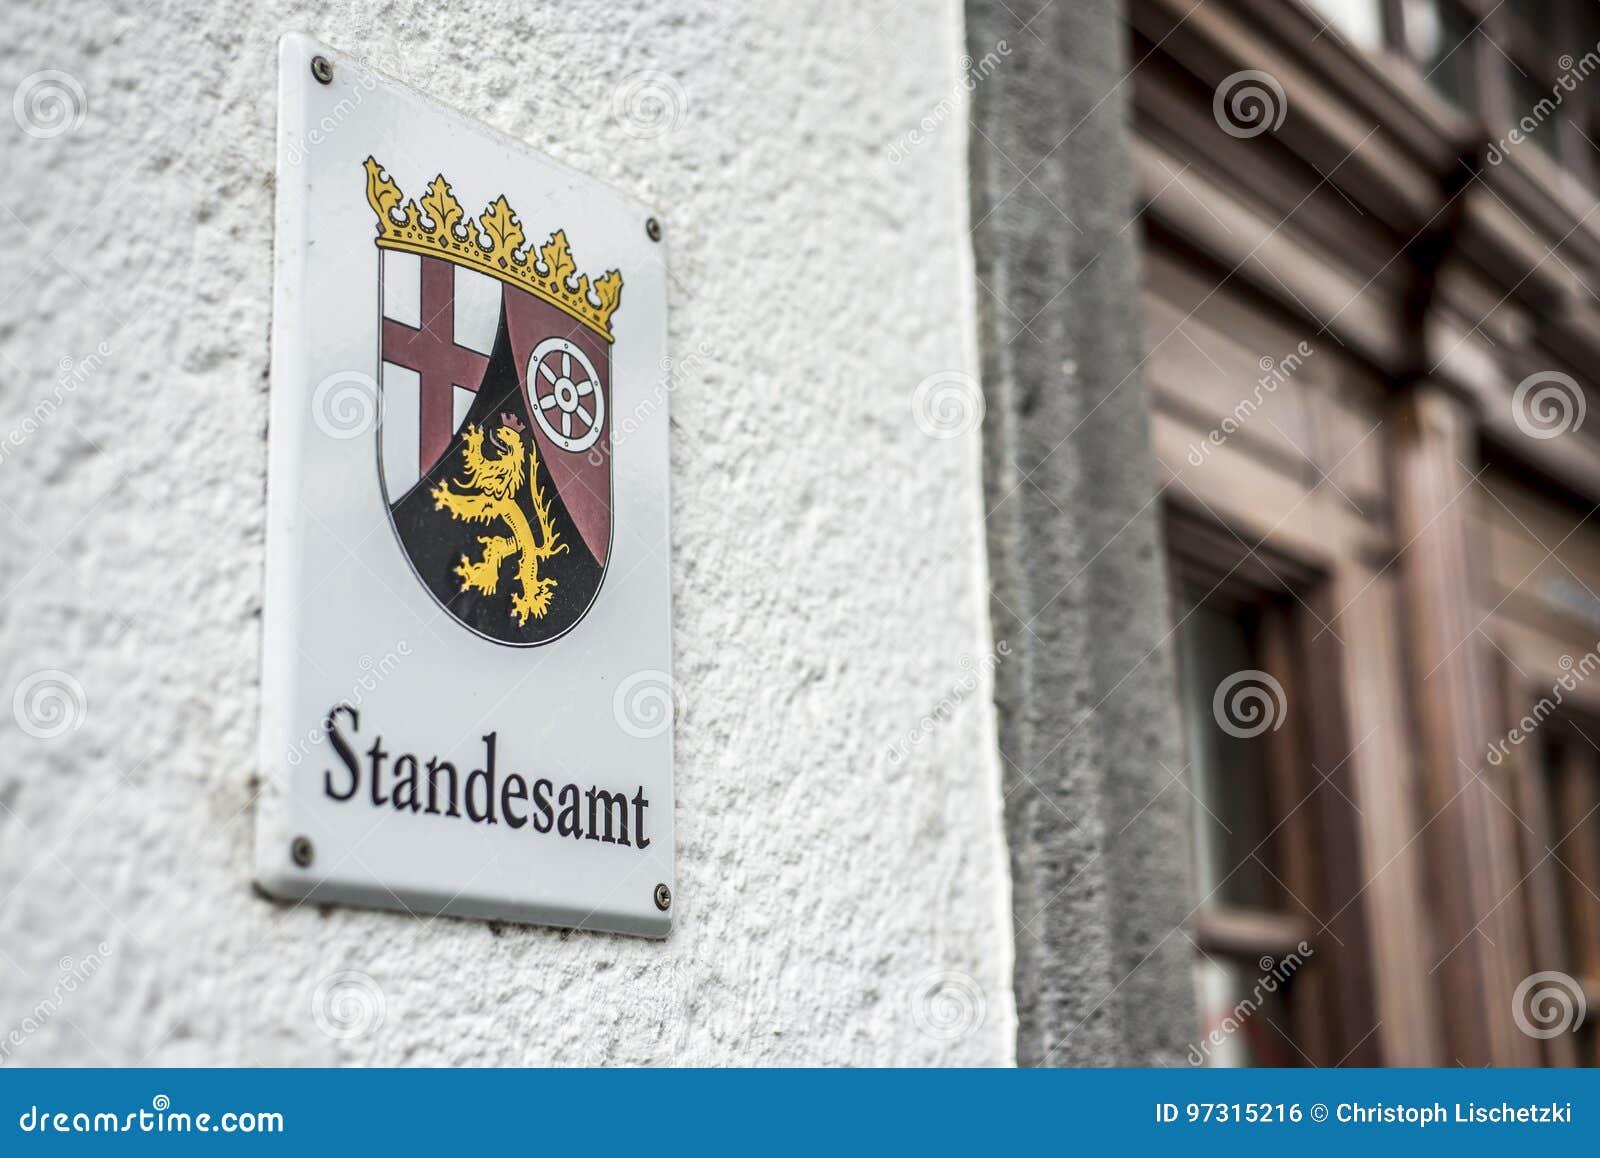 Bundestag allemand le bureau du bundestag allemand